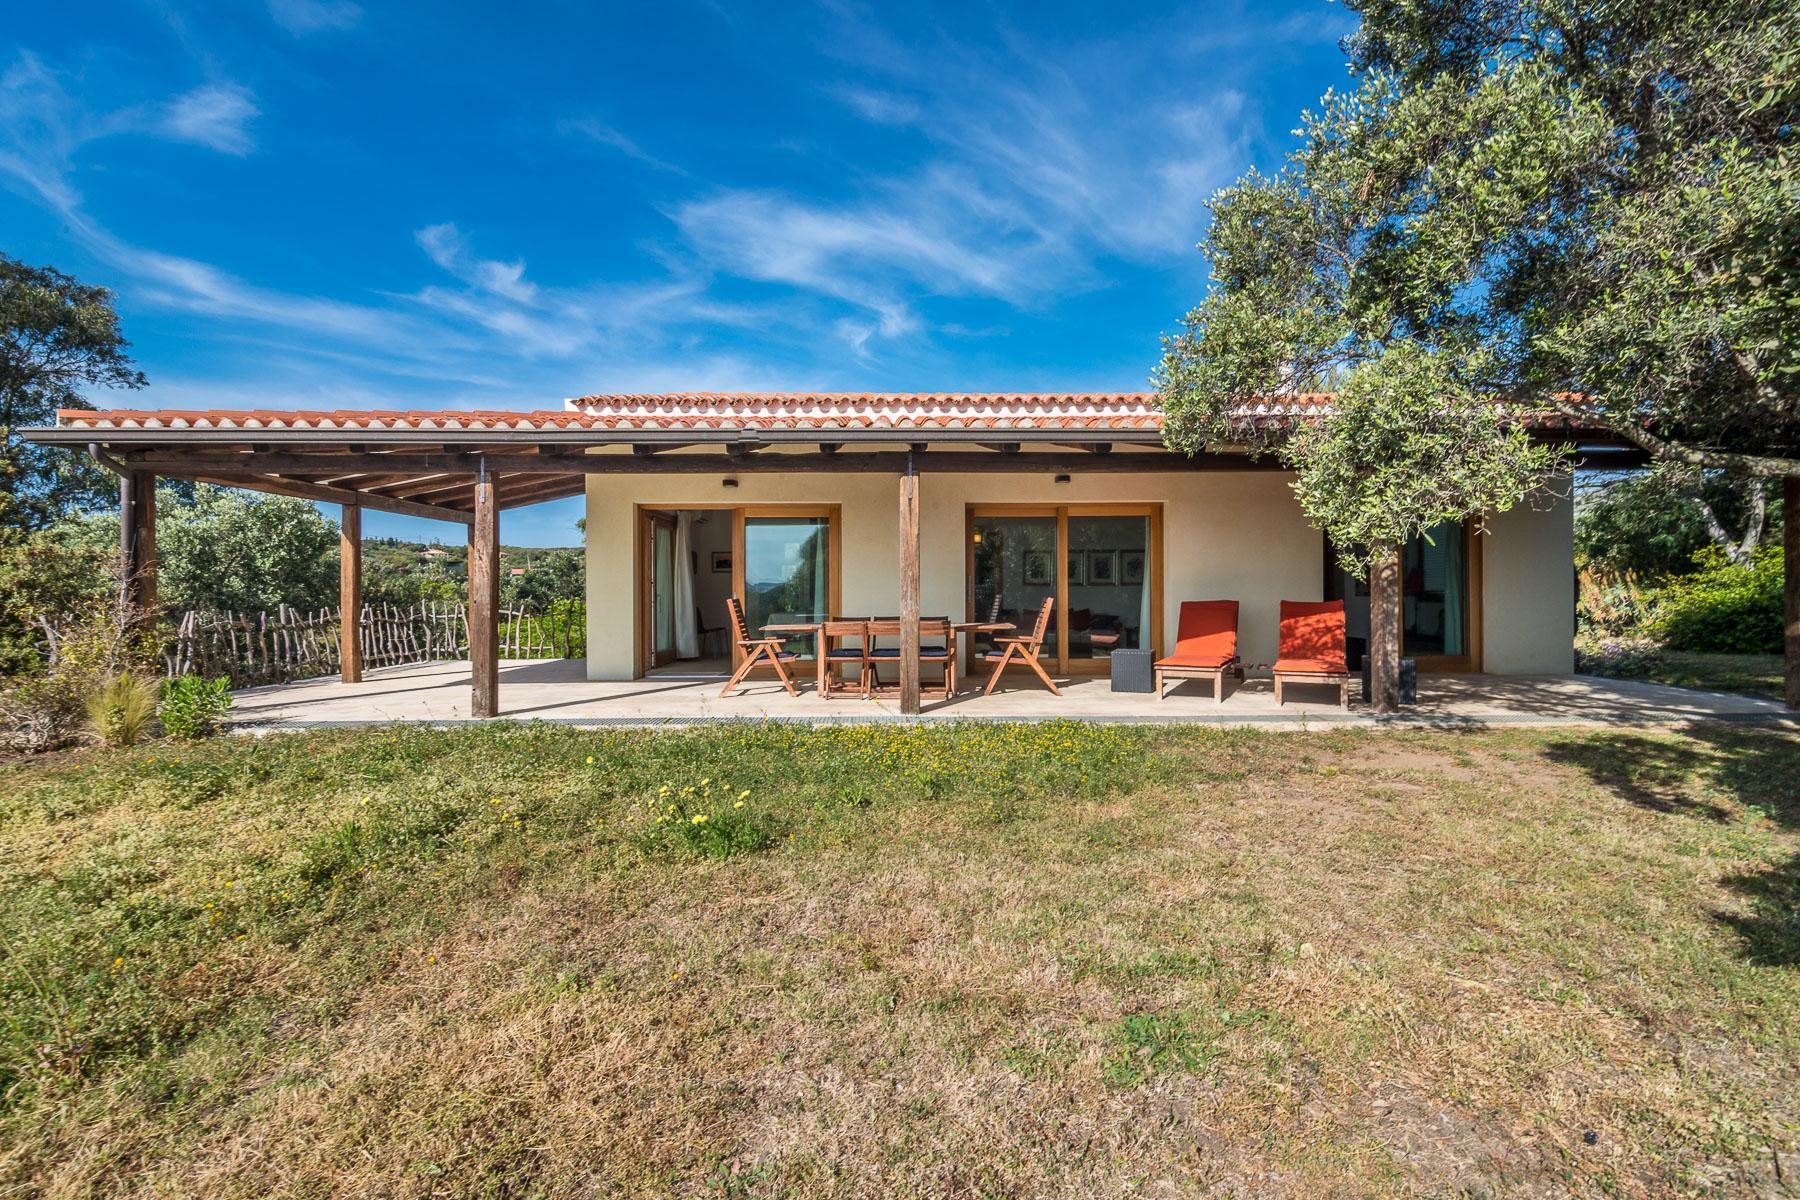 Golfo Aranci Sos Aranzos Wonderfull Villa with direct access to the beach - 1